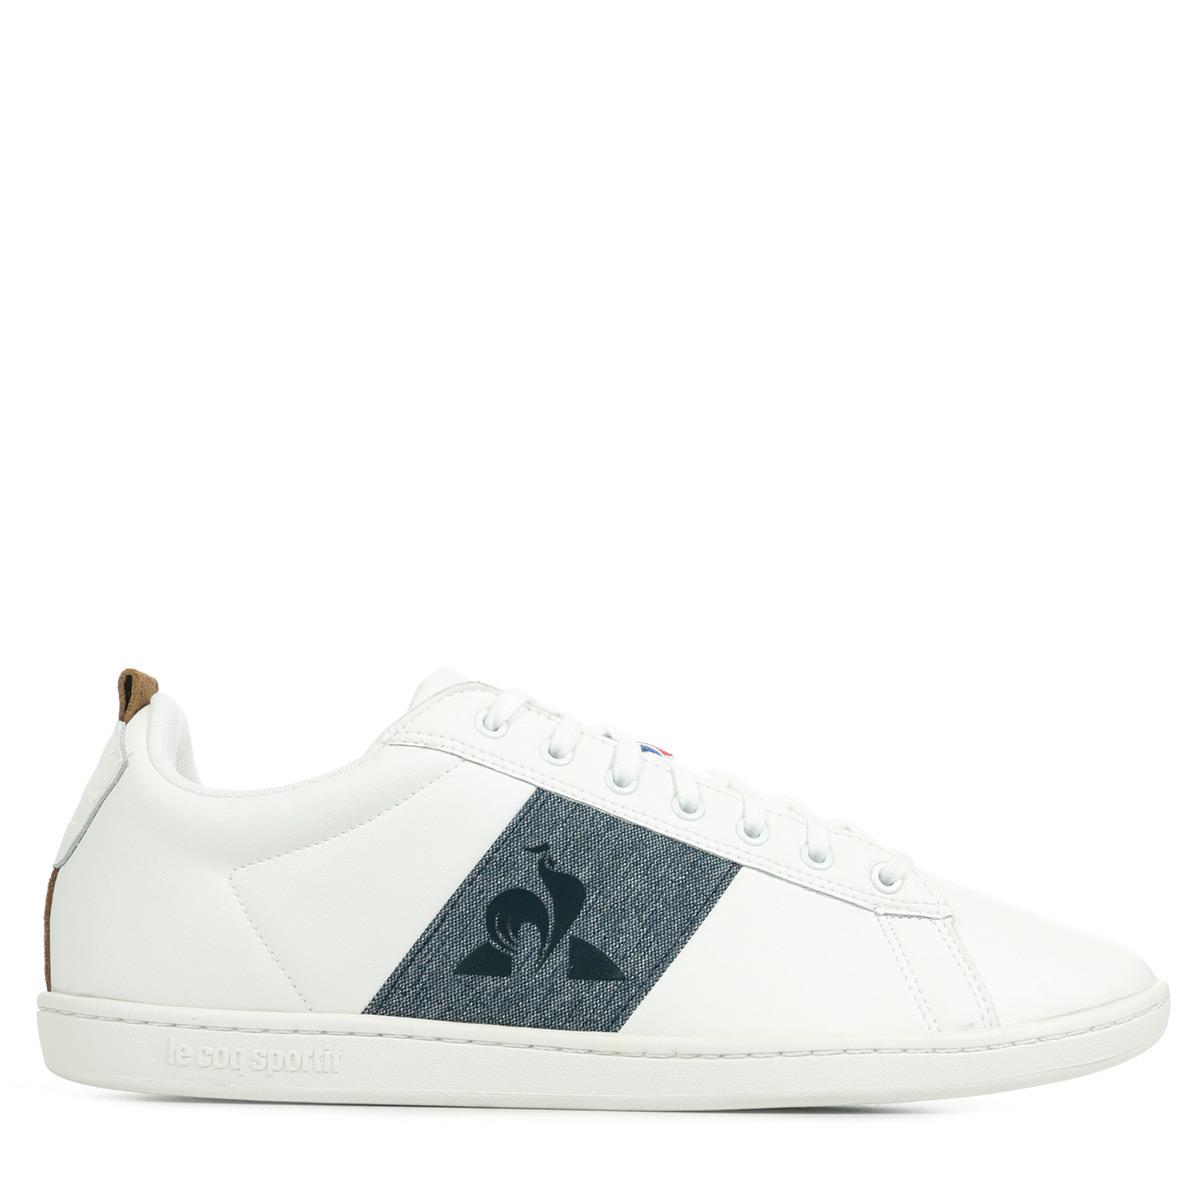 Le Coq Sportif Courtstar Craft Strap Denim Herren Sneaker Weiß 1921629 Schuhe